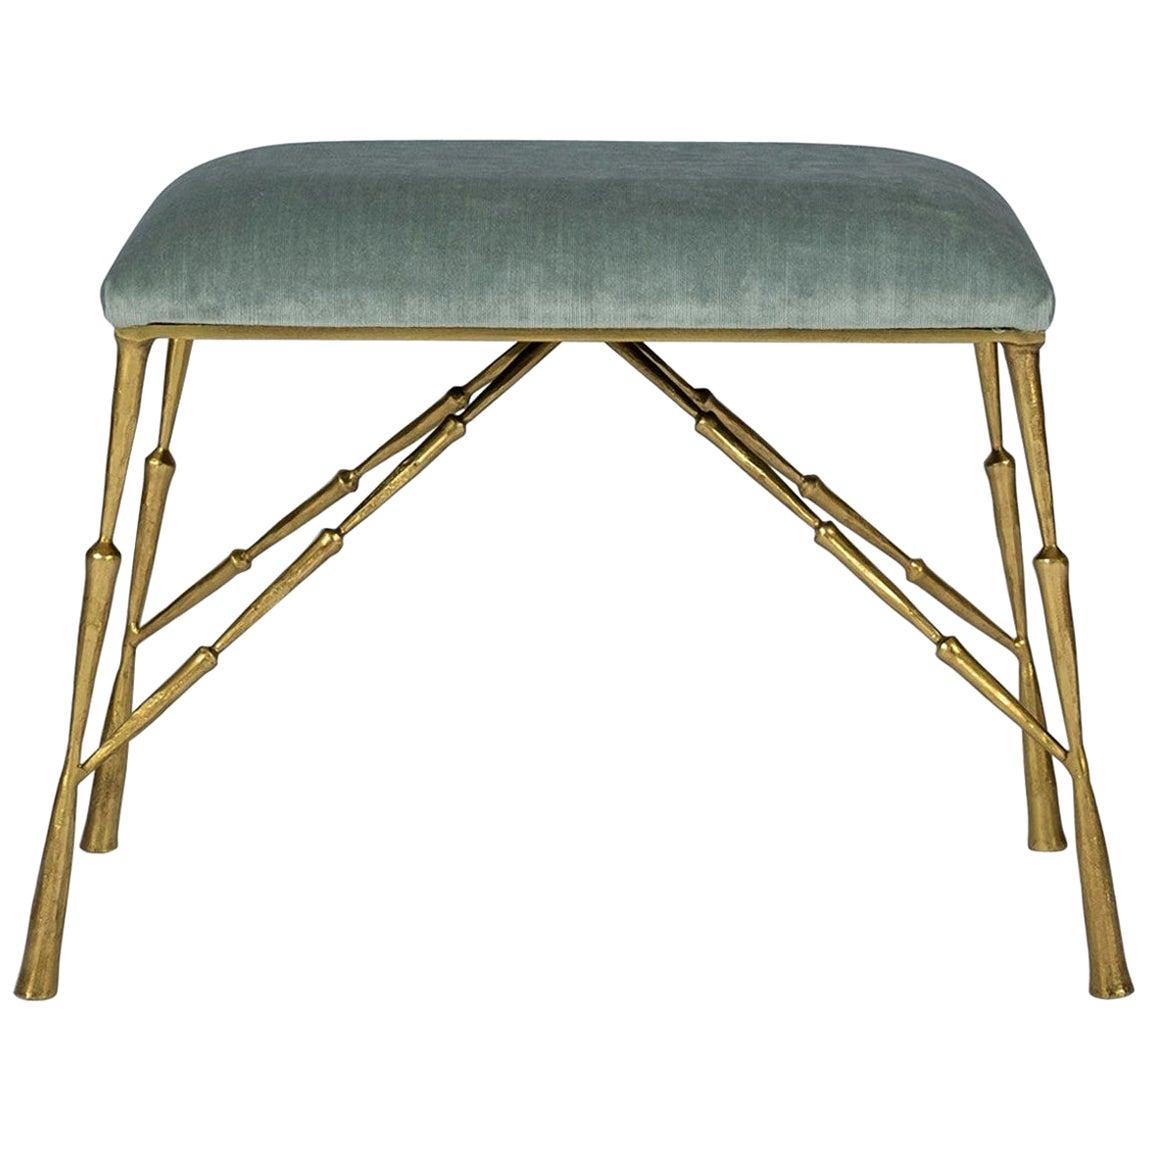 Contemporary Brass Bamboo Bench